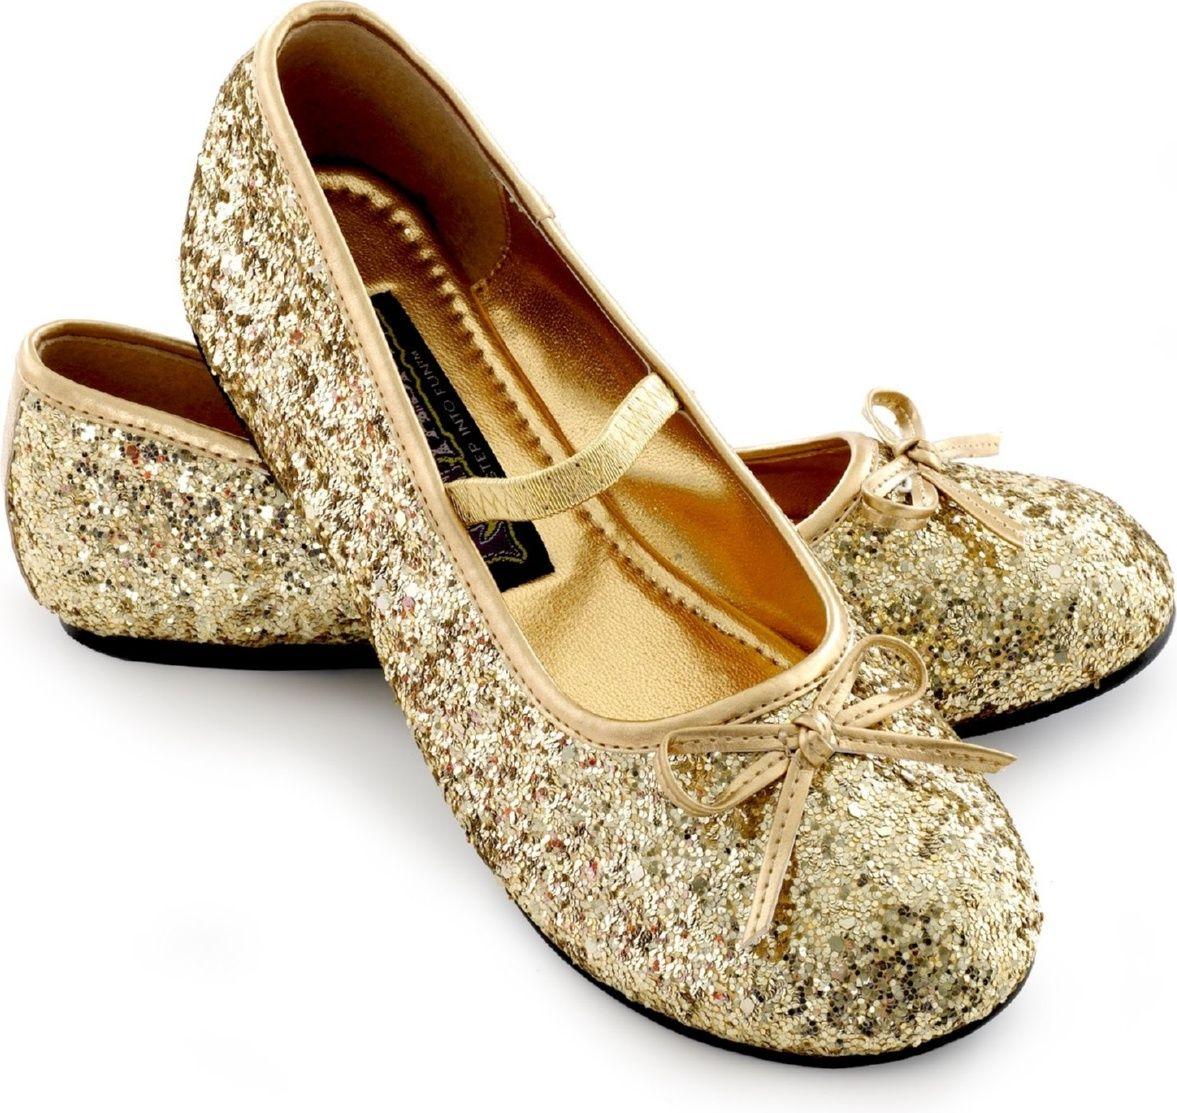 Gold Sparkle Ballerina Kids Shoes   Shoes for Kids   Pinterest ...